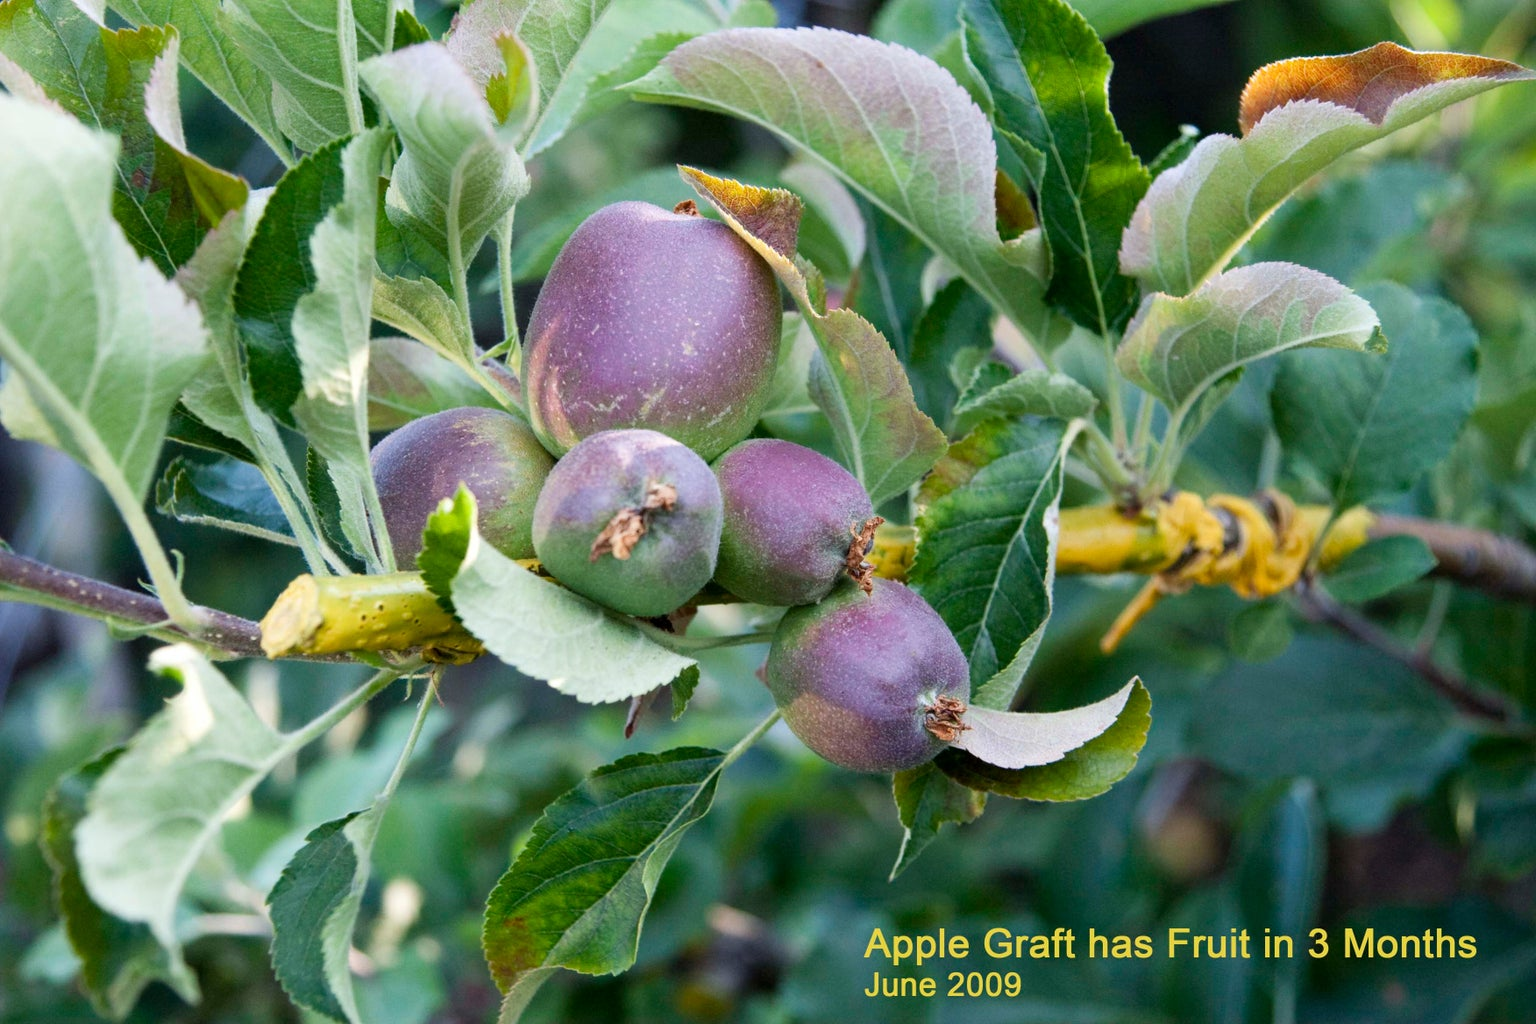 Example: Apple Graft